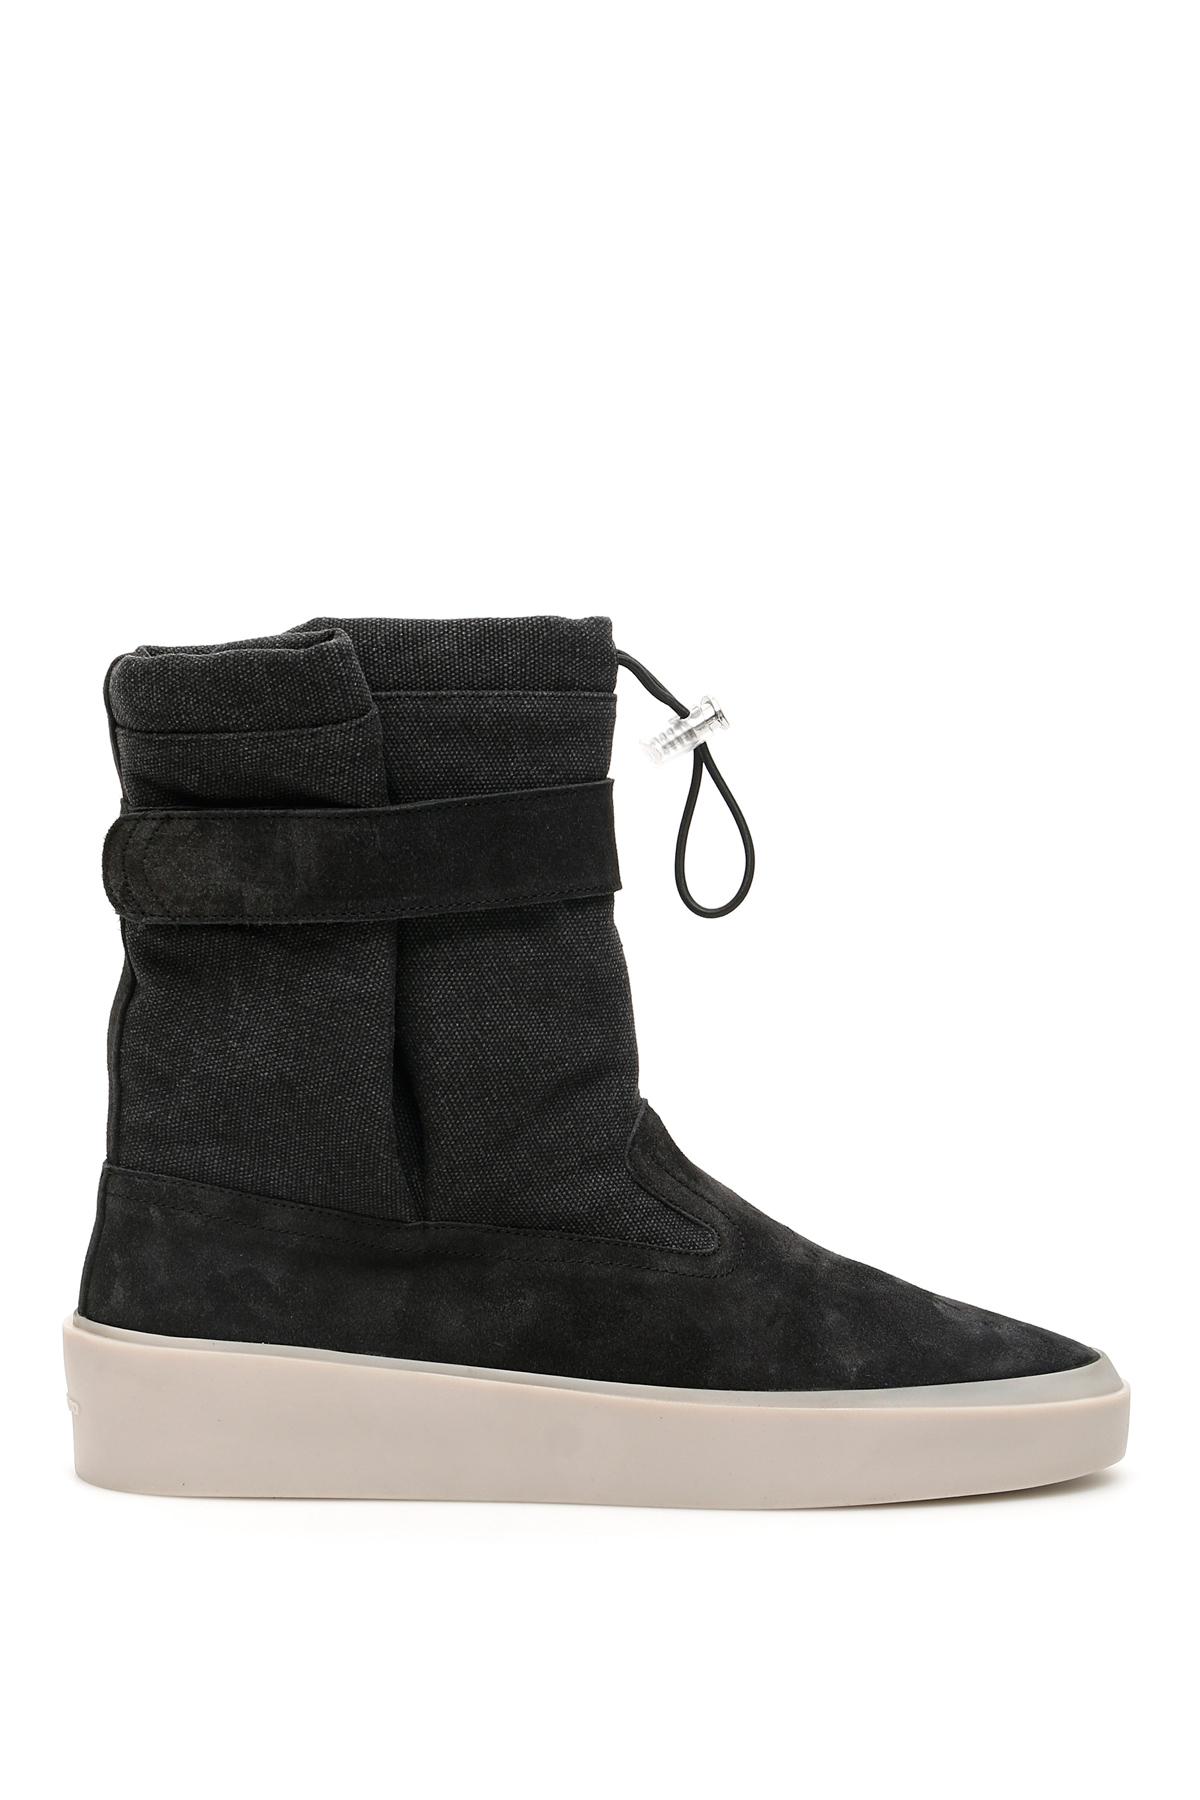 FEAR OF GOD SKI LOUNGE BOOTS 42 Grey, Black Cotton, Leather, Denim